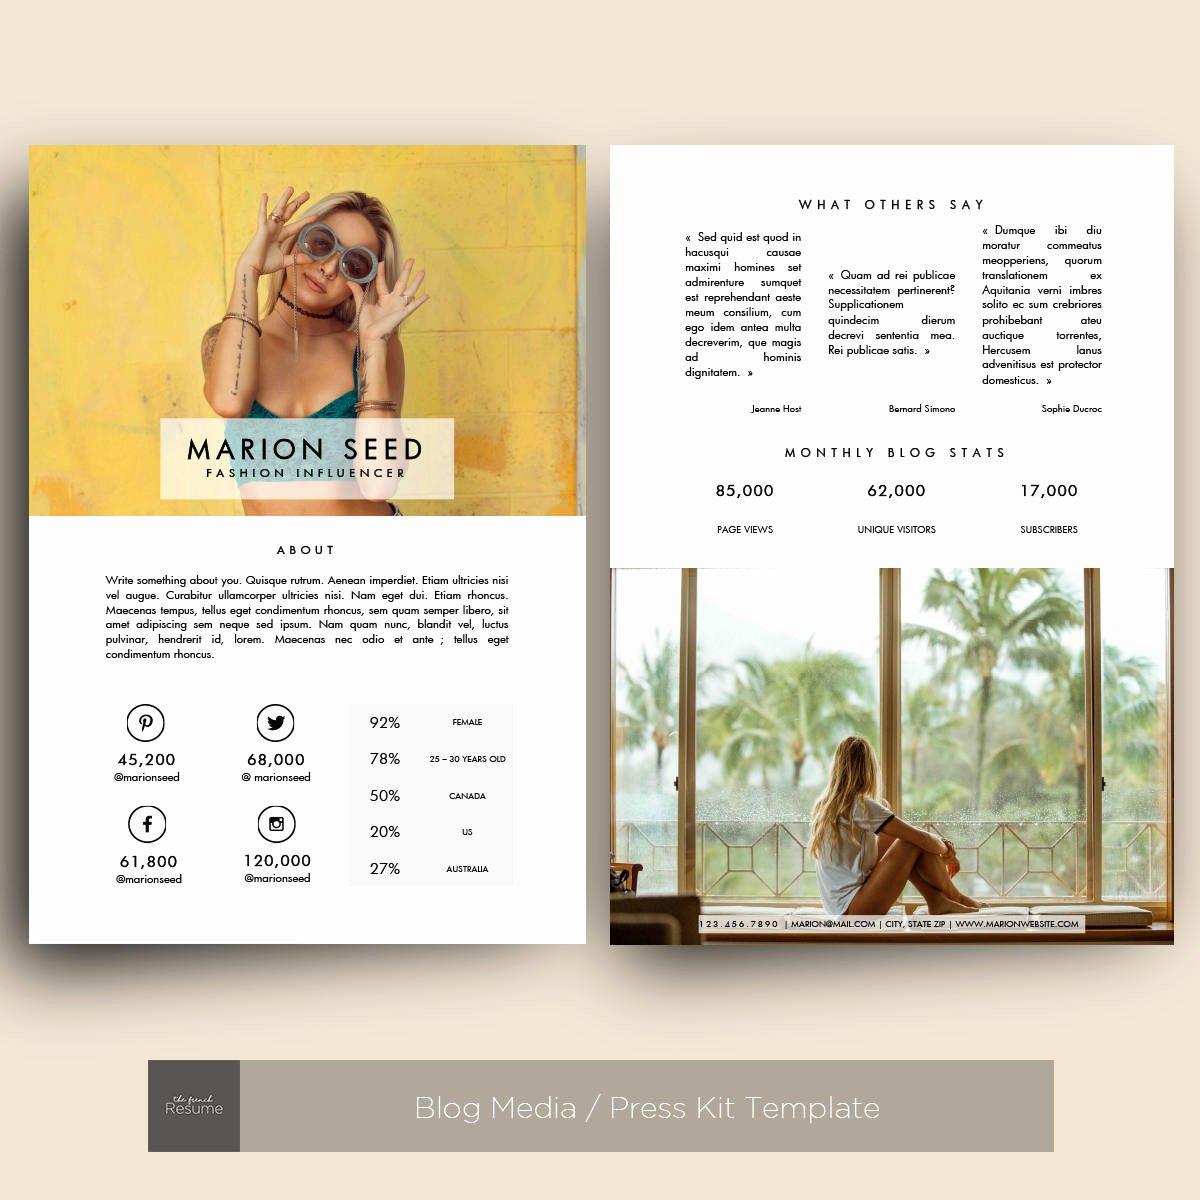 Press Kit Template Word Inspirational Blog Media Press Kit Template for Ms Word Model 03